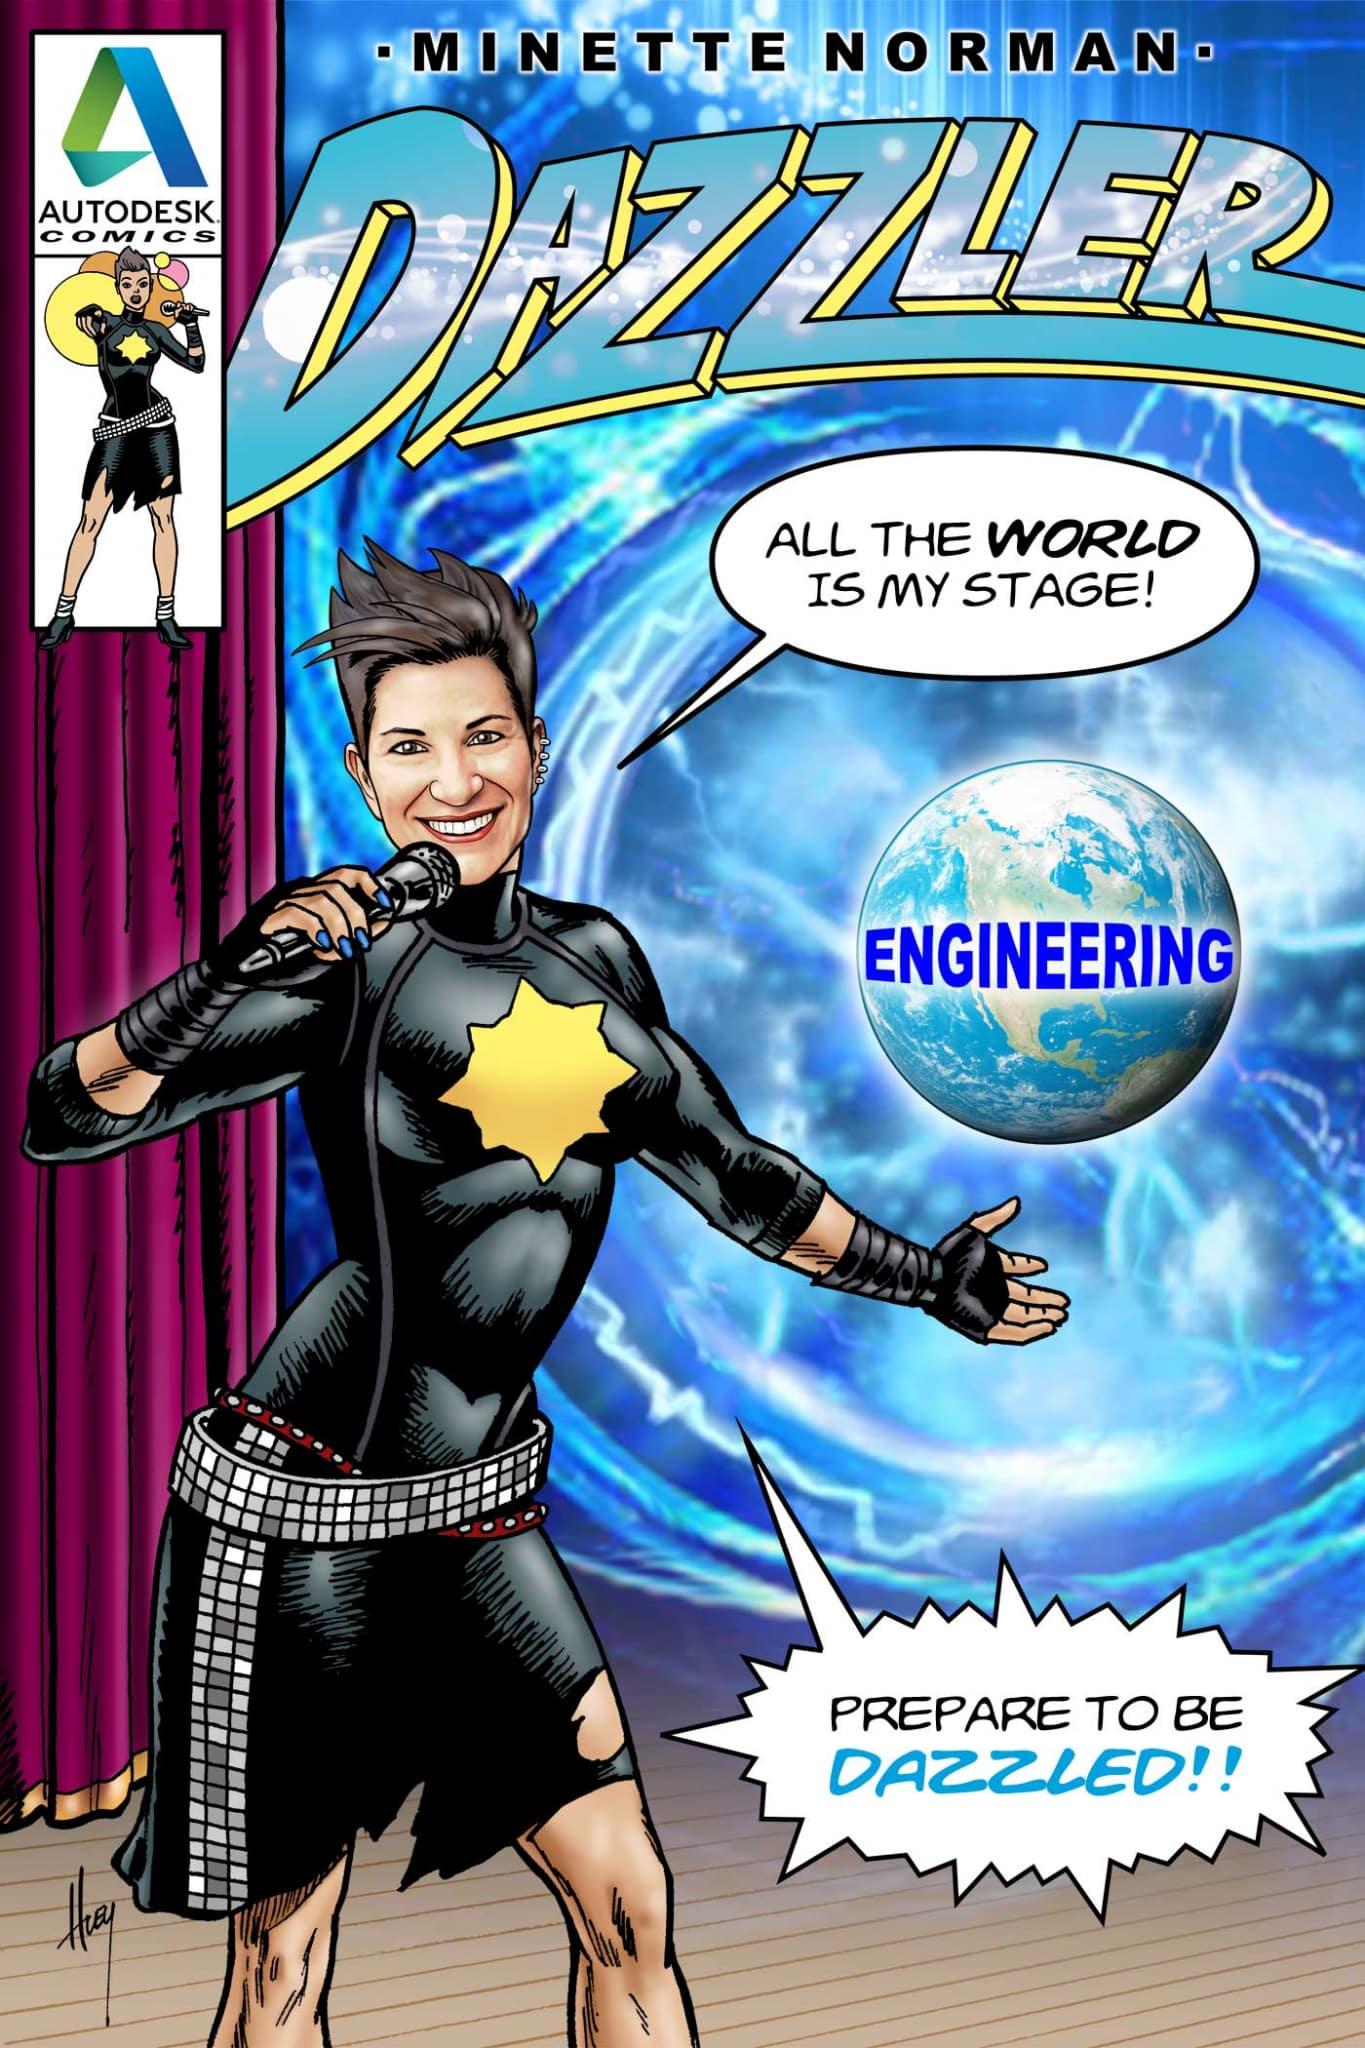 KH3432DZ-dazzler-on-stage-superhero-comic